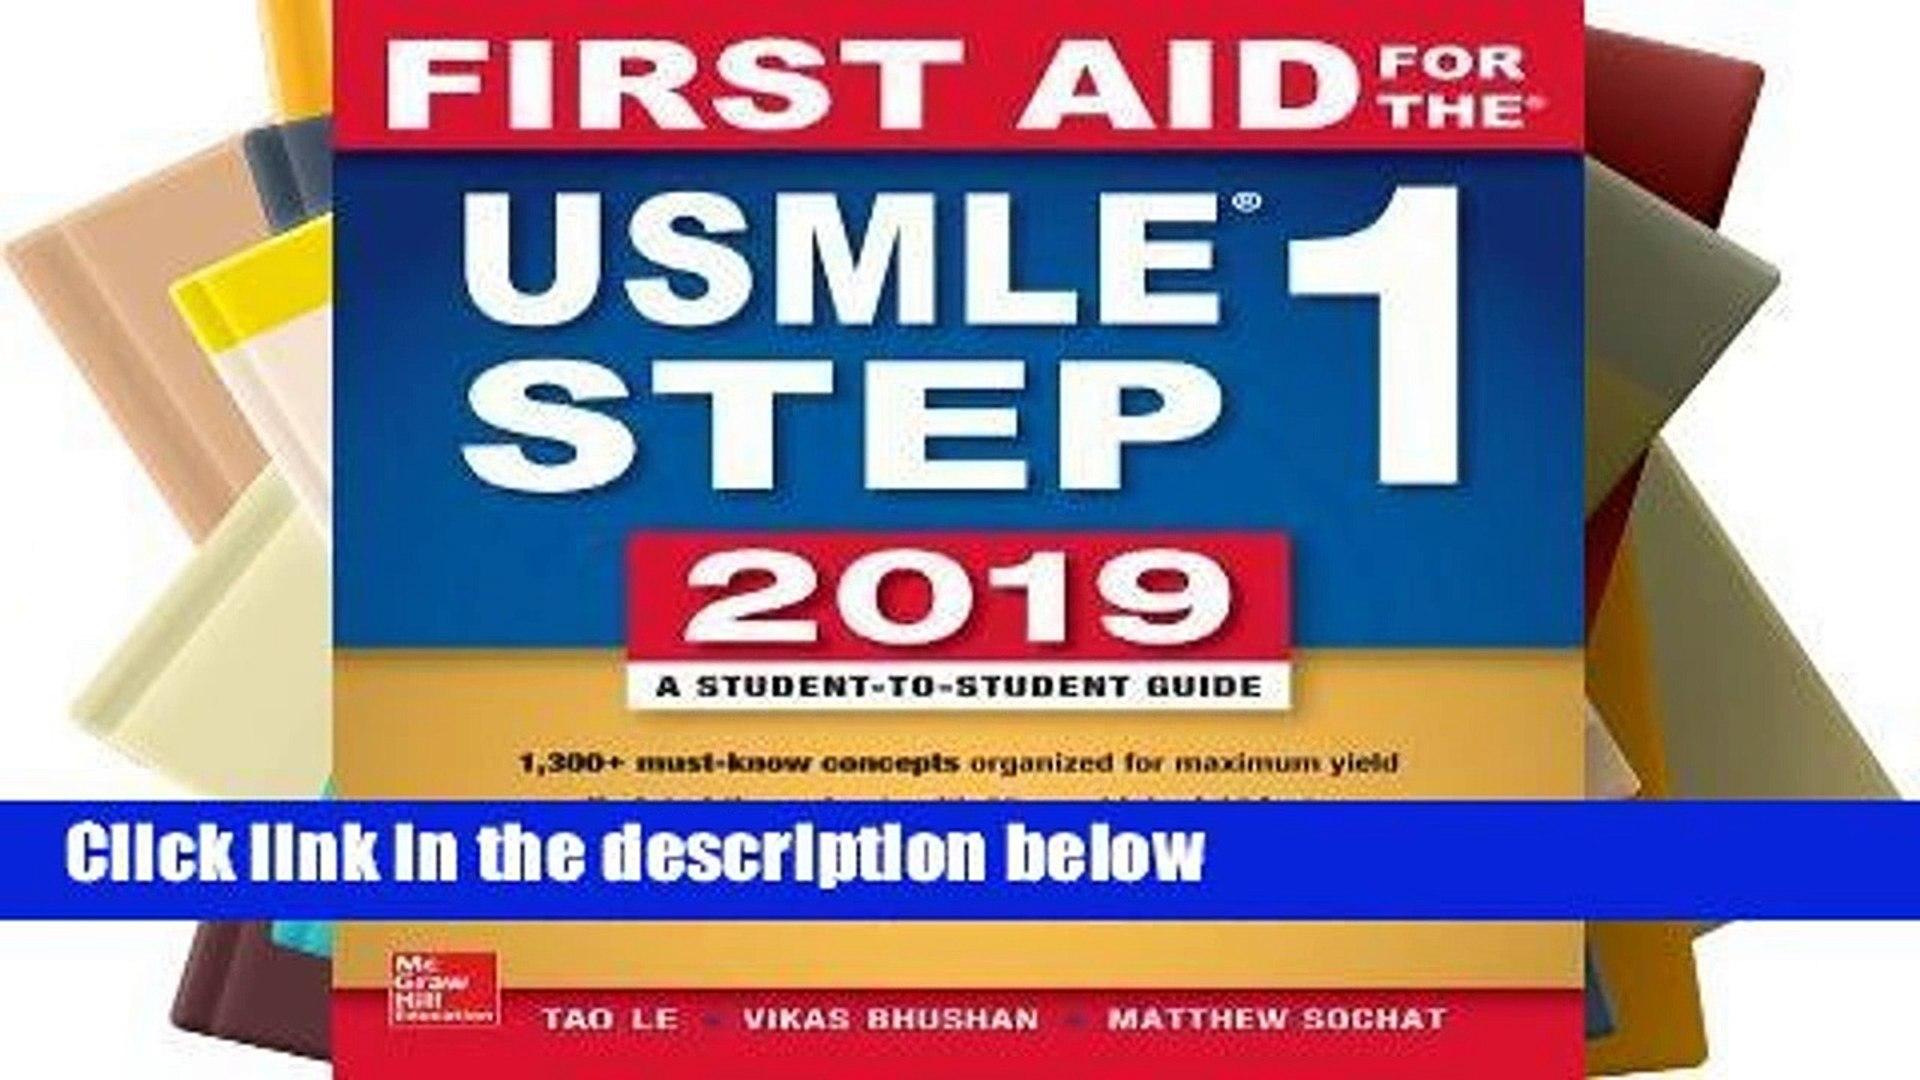 R E A D First Aid for the USMLE Step 1 2019, Twenty-Ninth Edition  D O W N L O A D